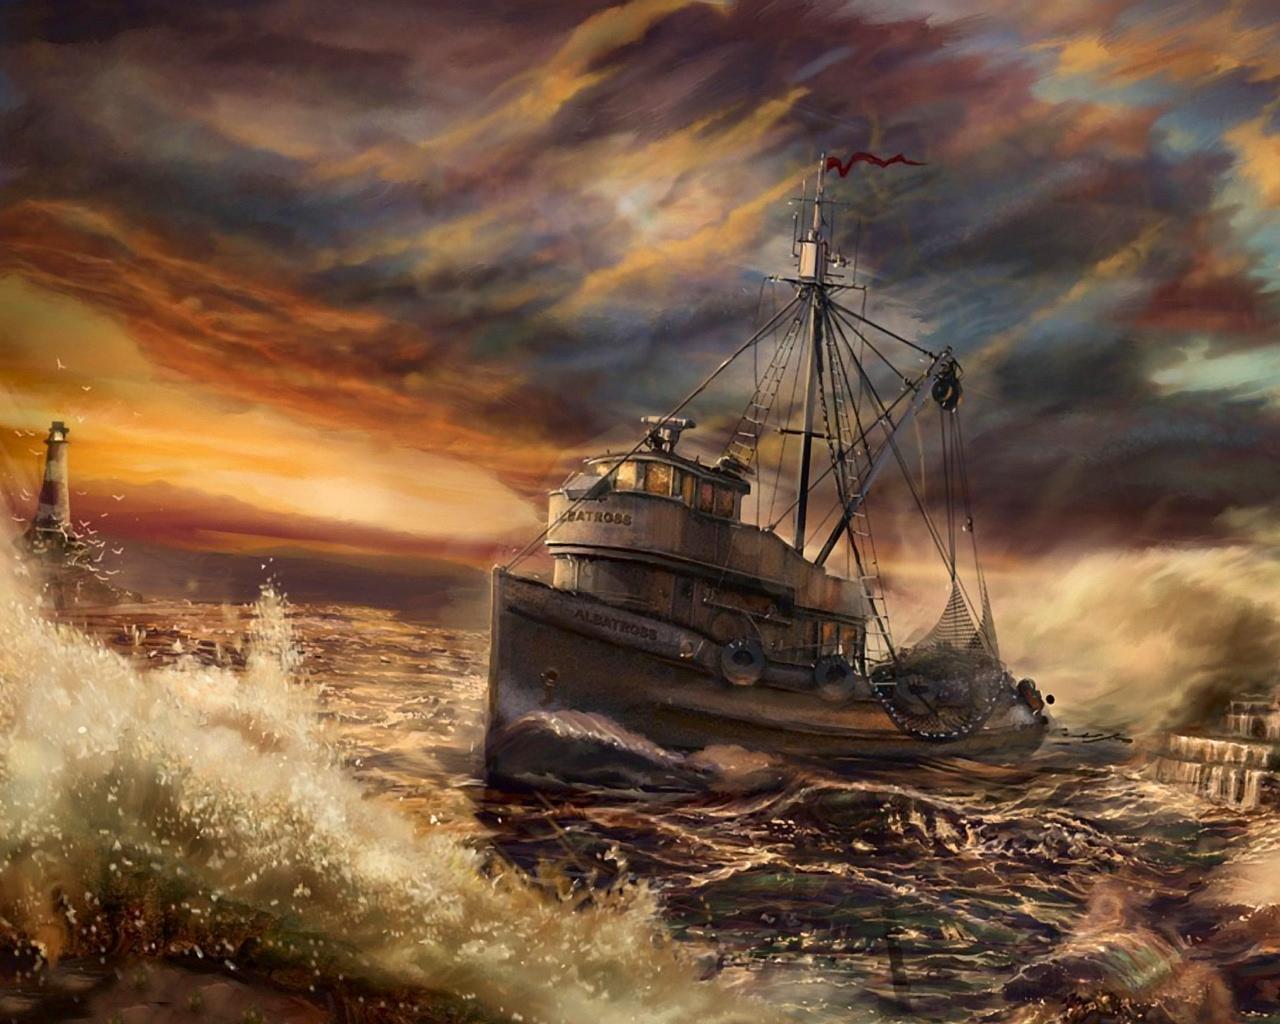 Previous, Drawn wallpapers - Fishing boat wallpaper